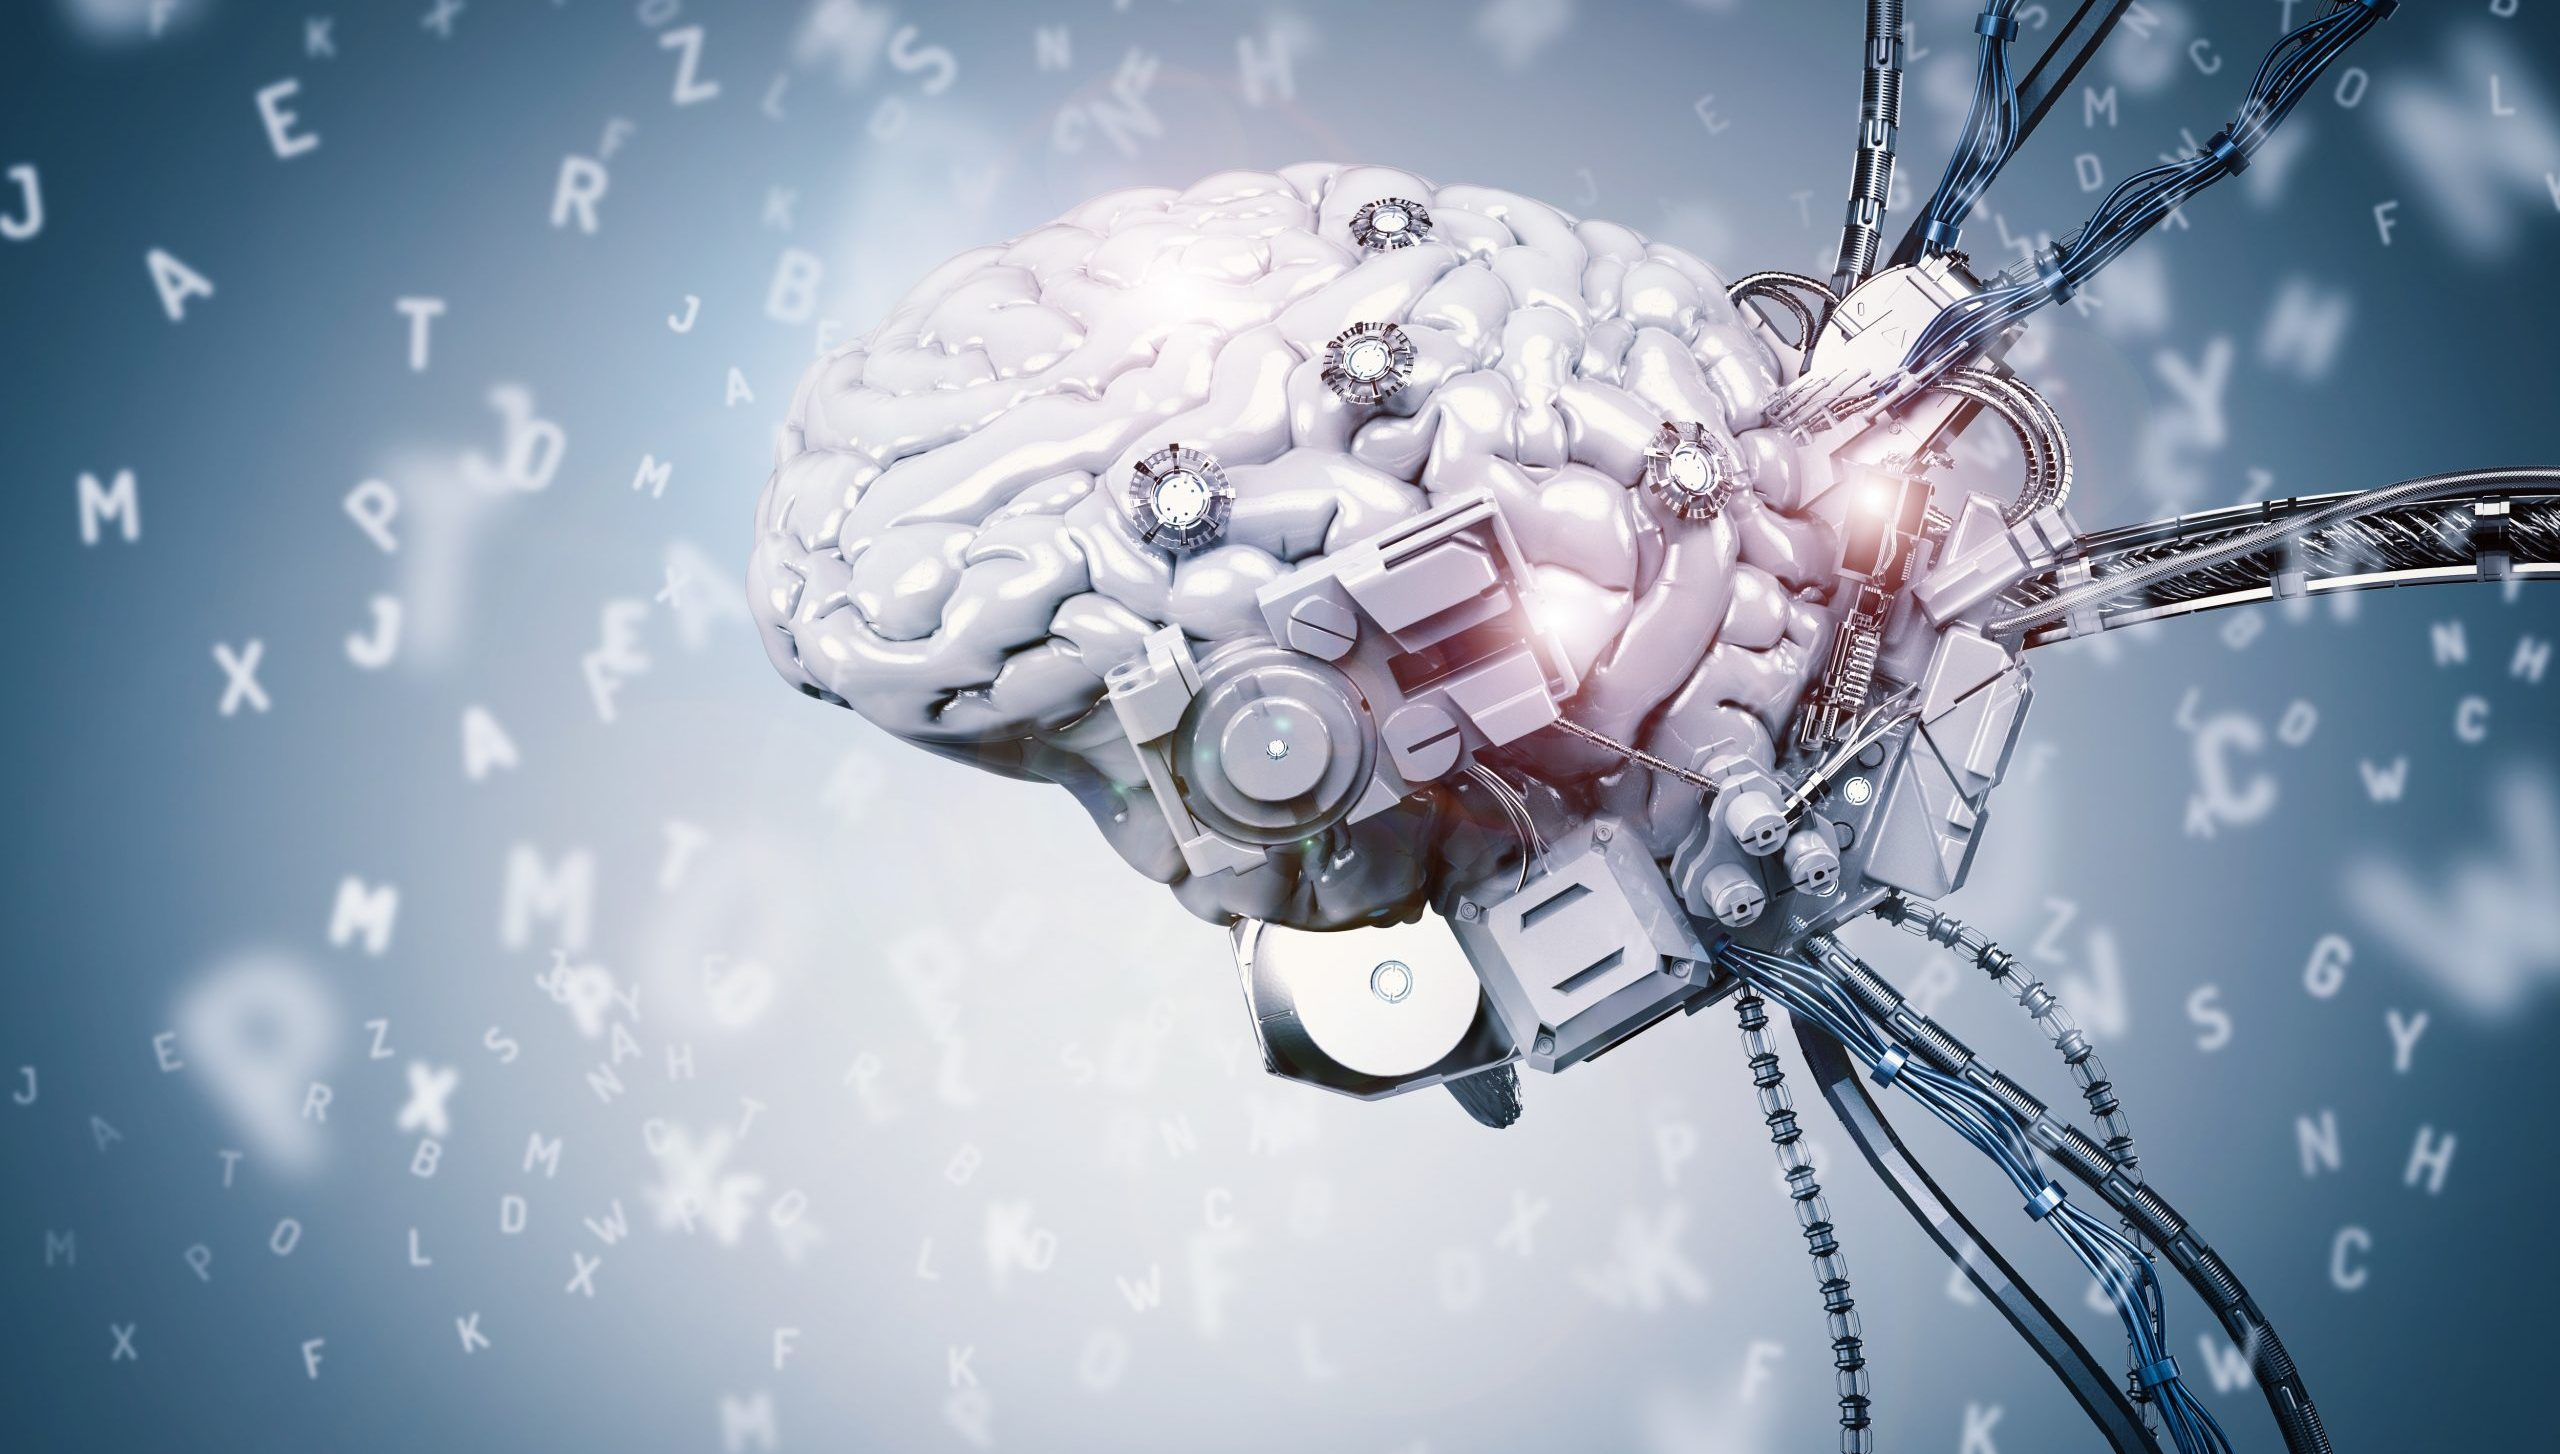 rmda-ss-brain-connected-machine.2560.1706